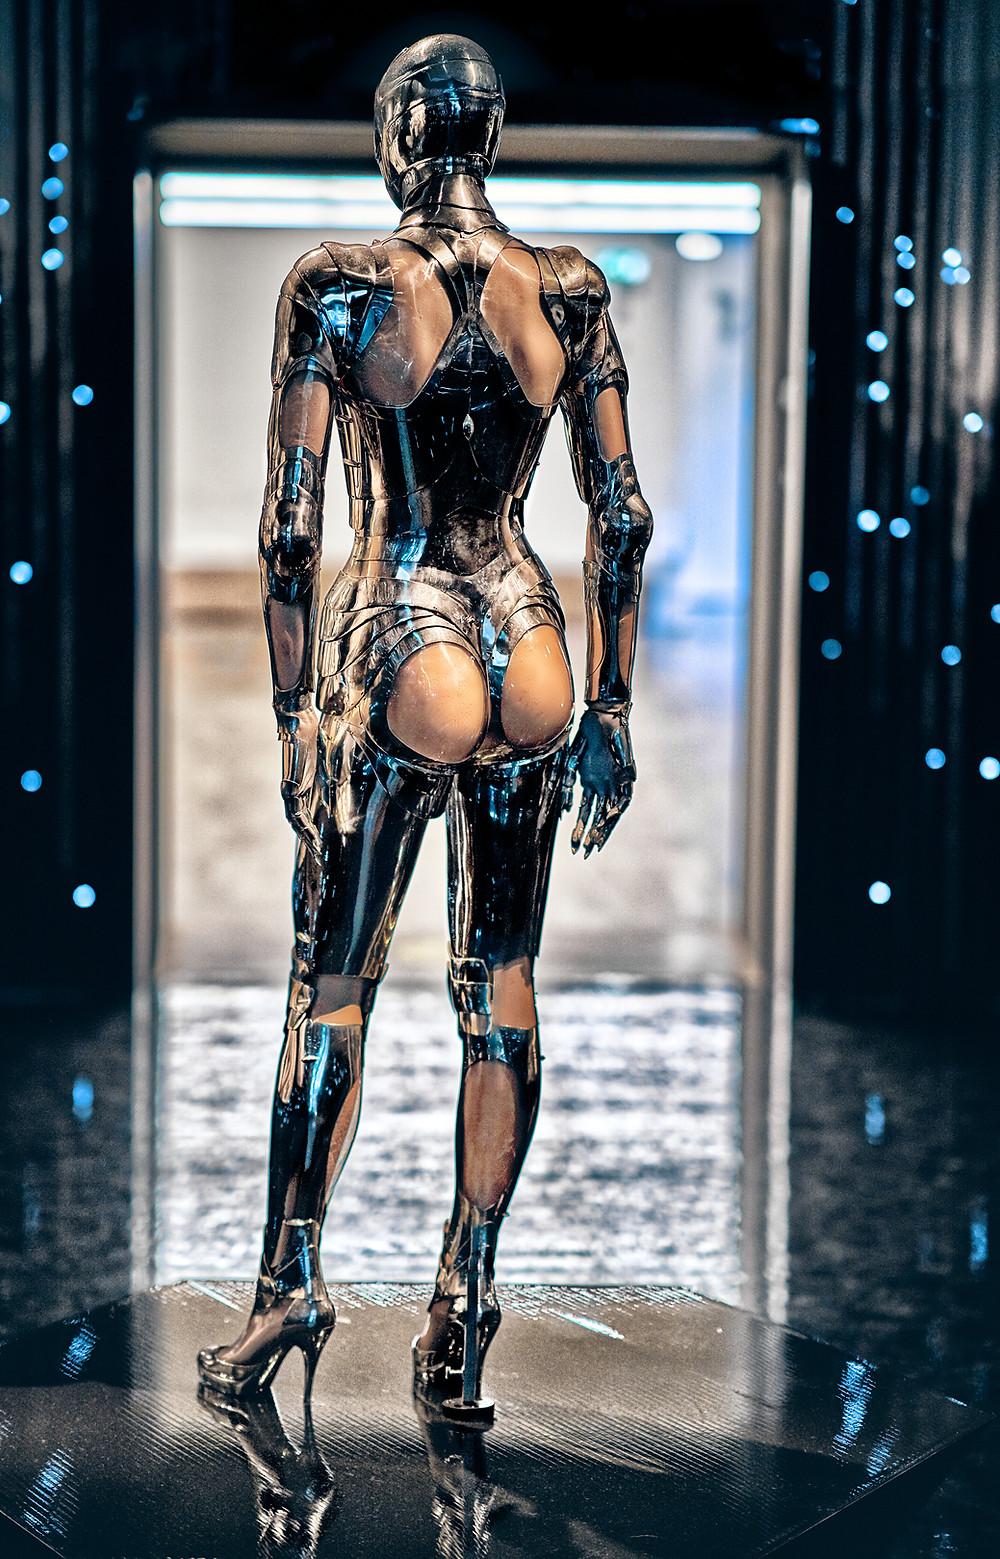 Thierry Mugler Cyborg Design (Fem-Bot)